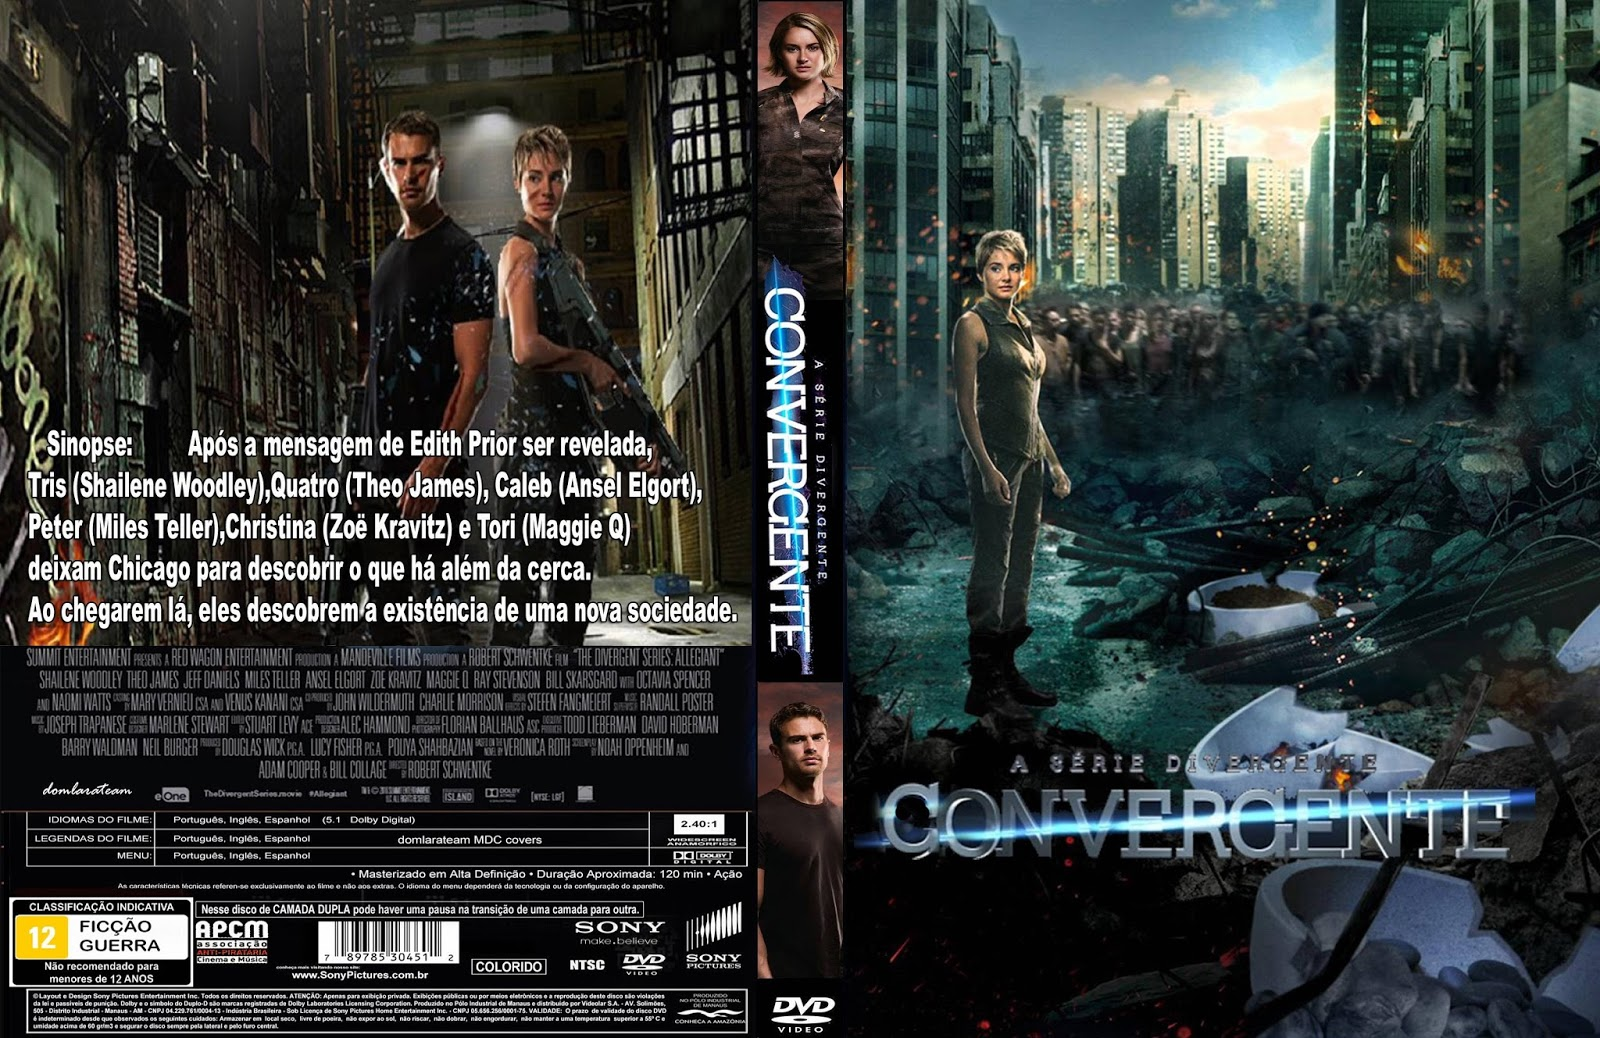 A Série Divergente Convergente DVD-R A 2BS 25C3 25A9rie 2BDivergente 2BConvergente 2B2016 2BXANDAODOWNLOAD